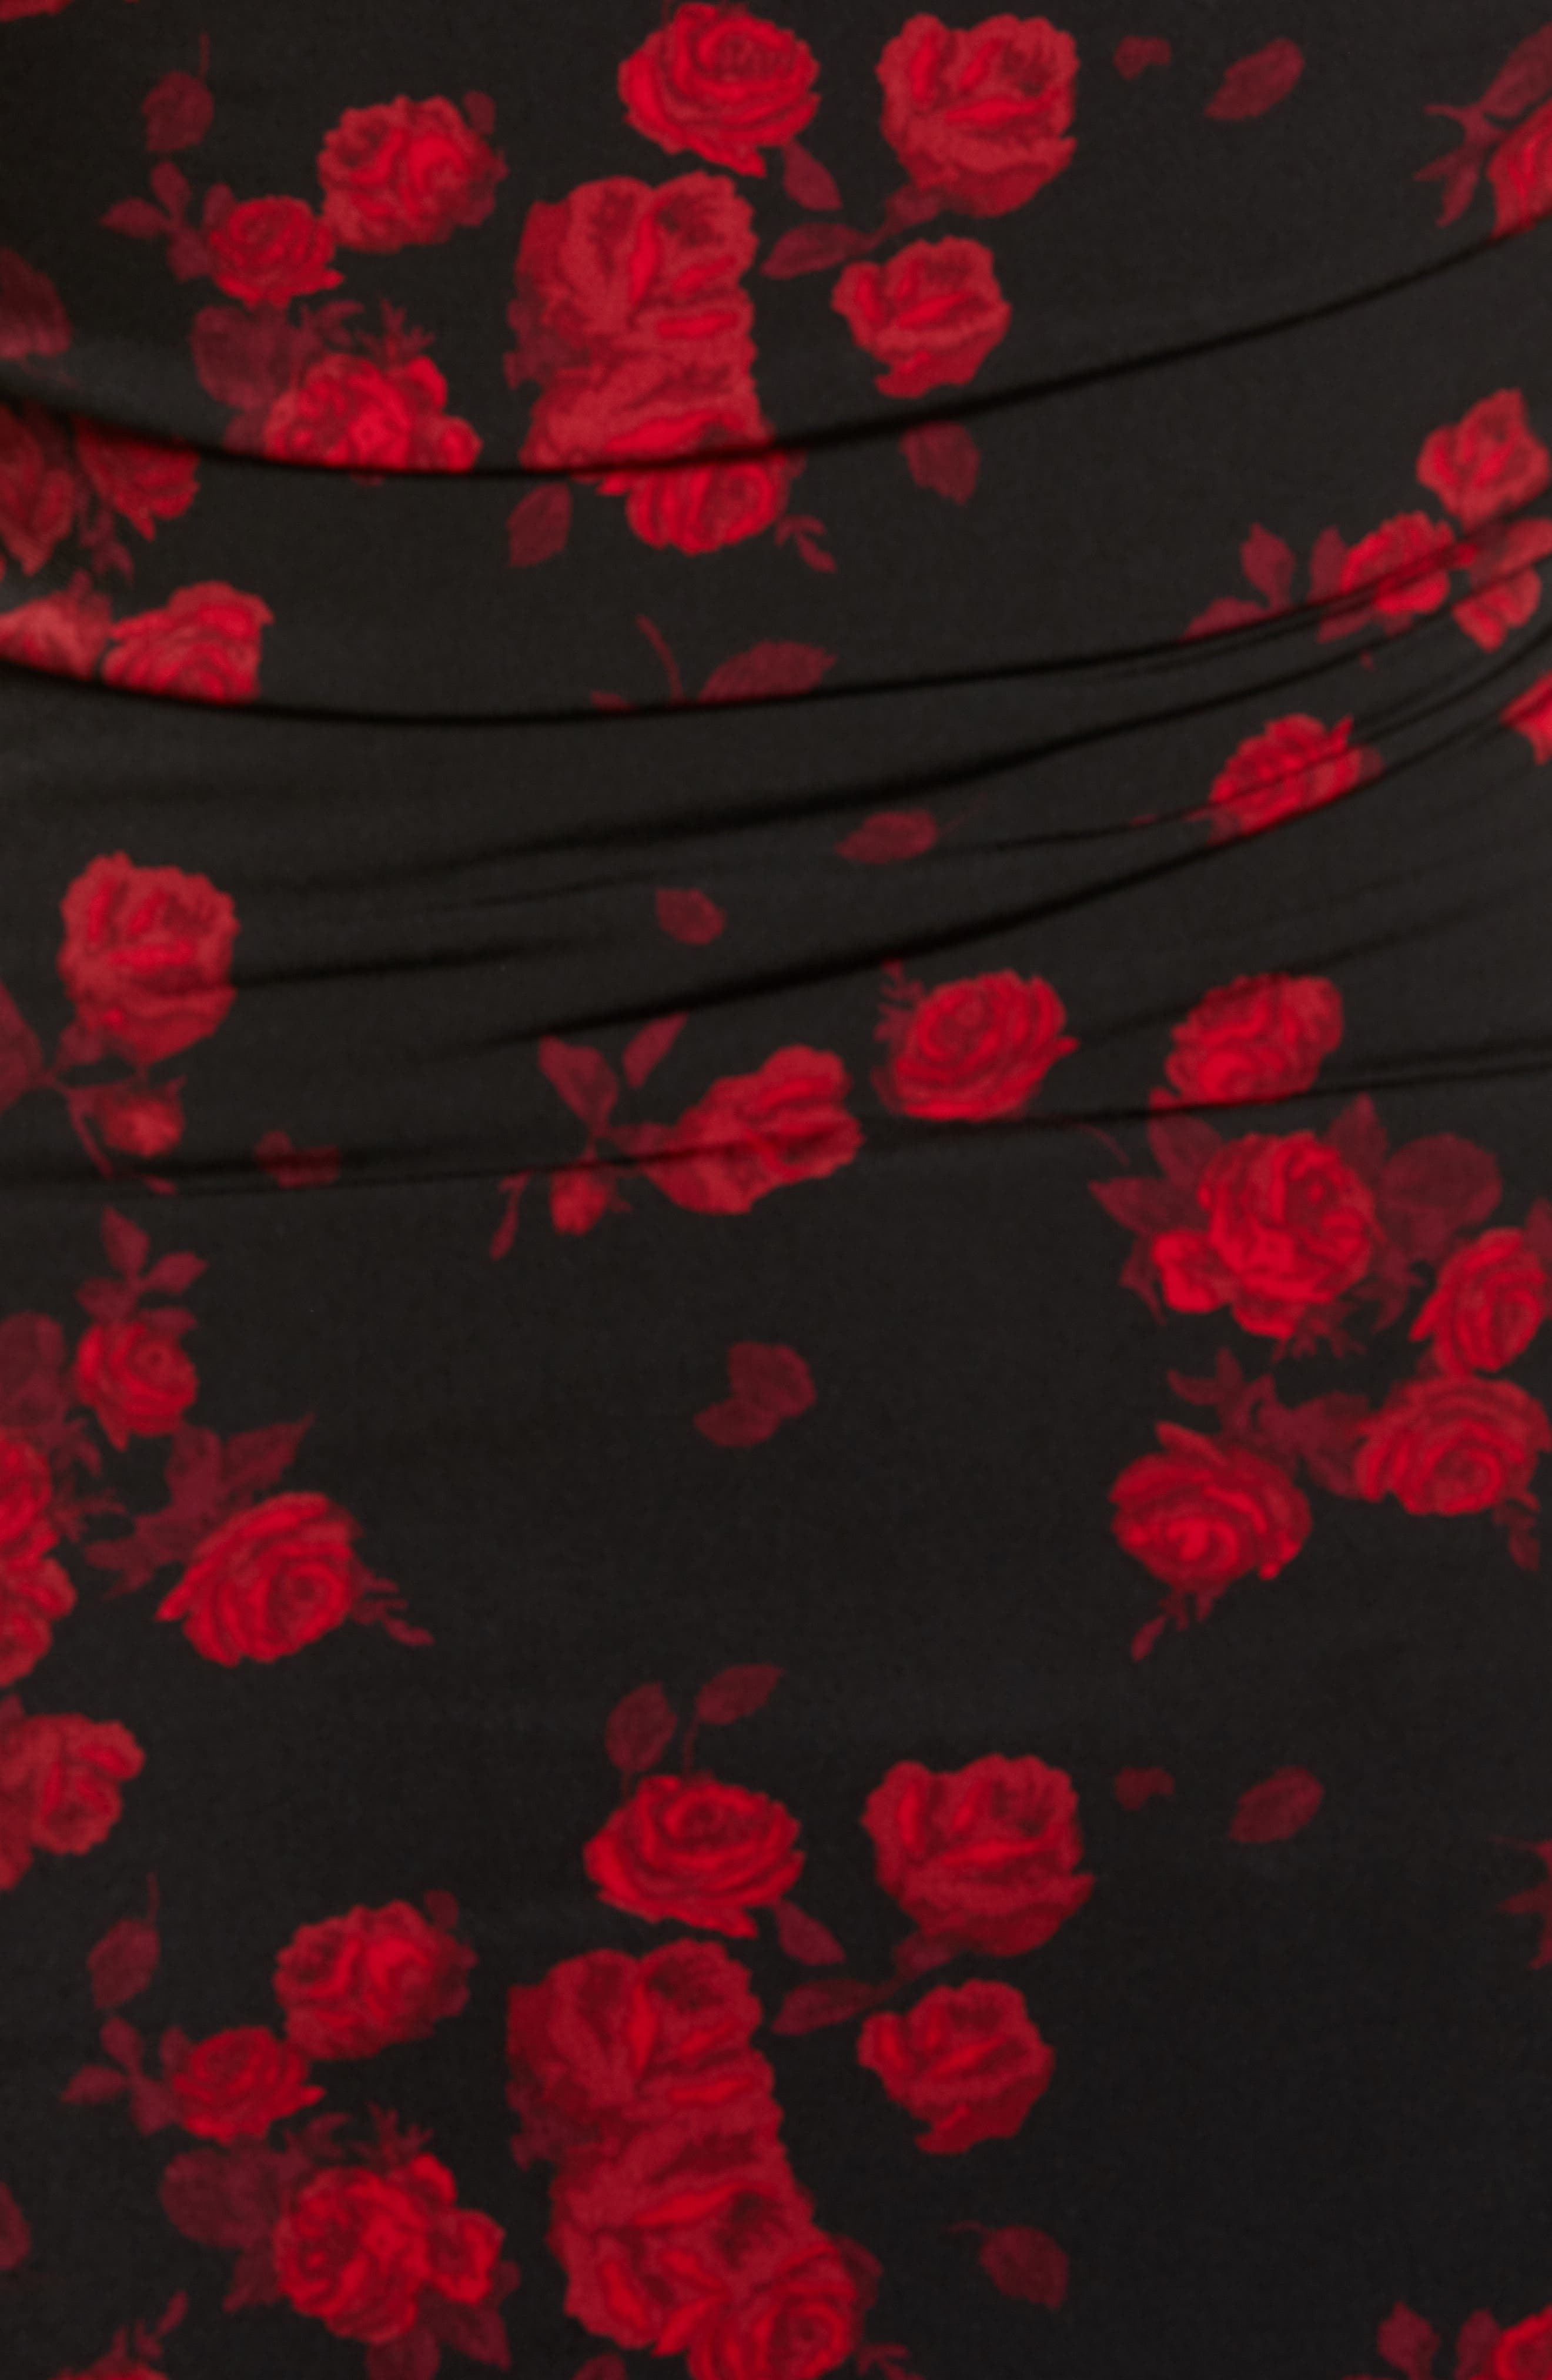 Off the Shoulder Rose Top,                             Alternate thumbnail 5, color,                             600